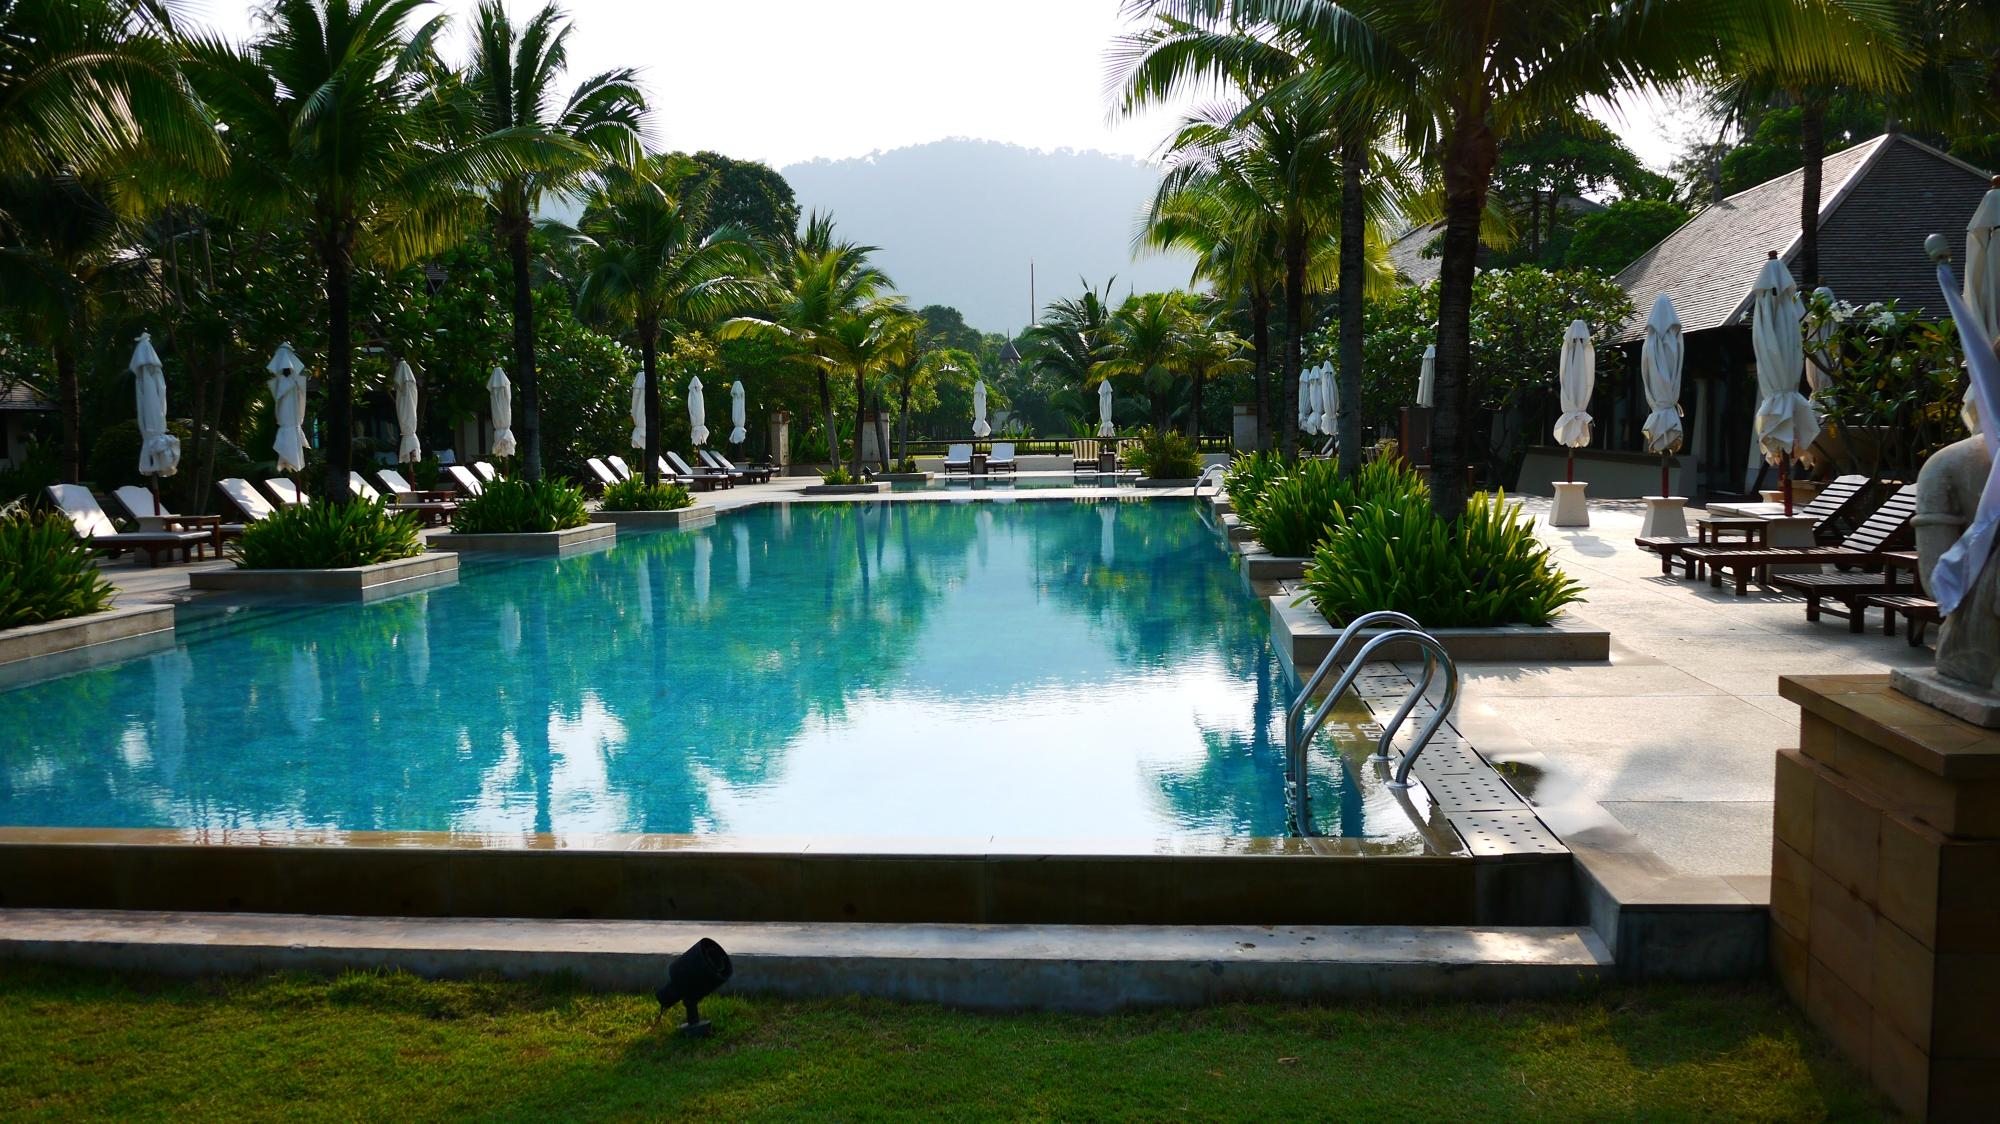 pool (40502010)